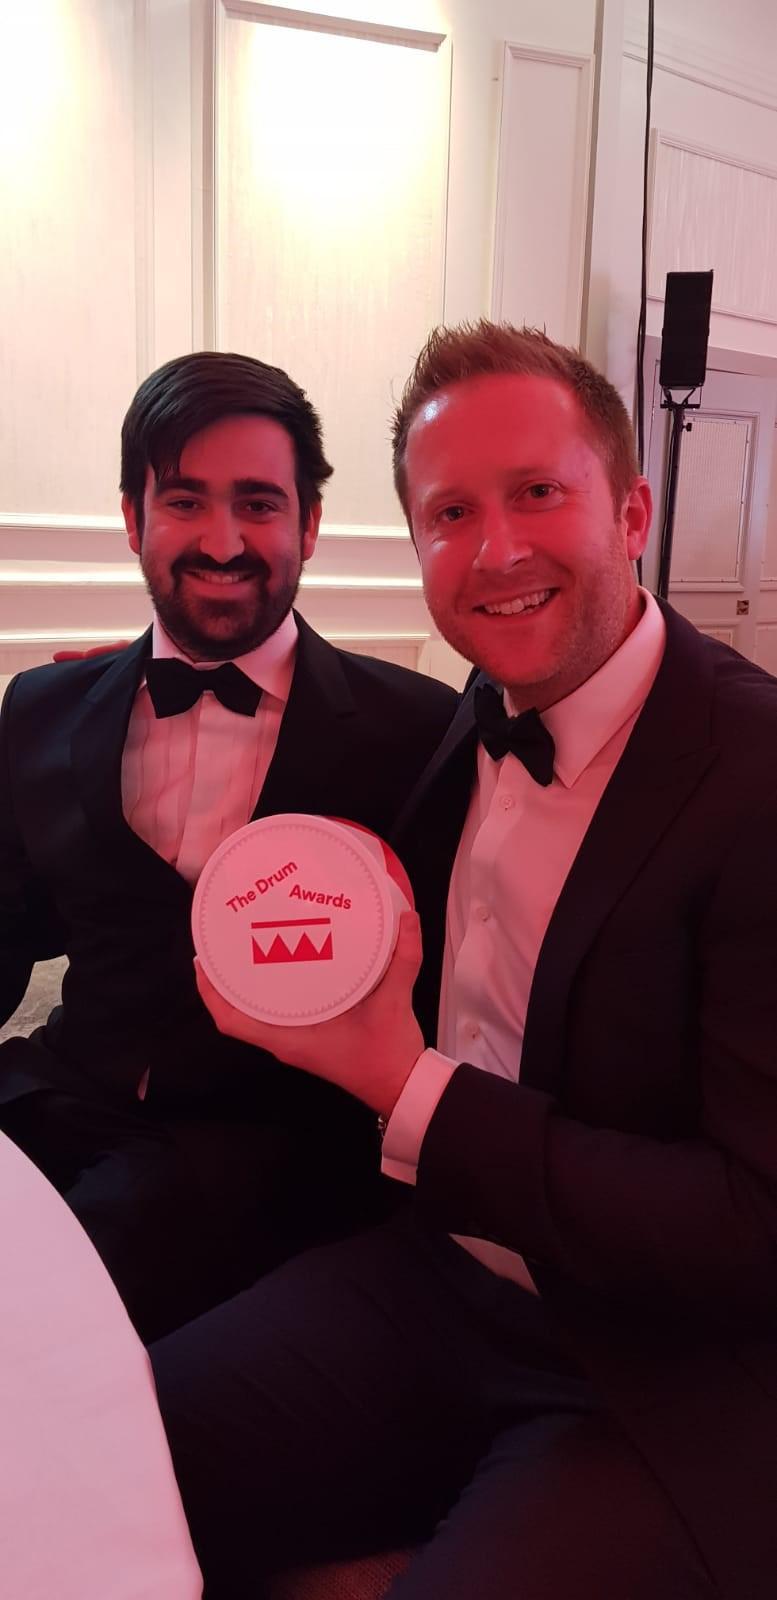 Receptioanl Win Digital Marketing Award